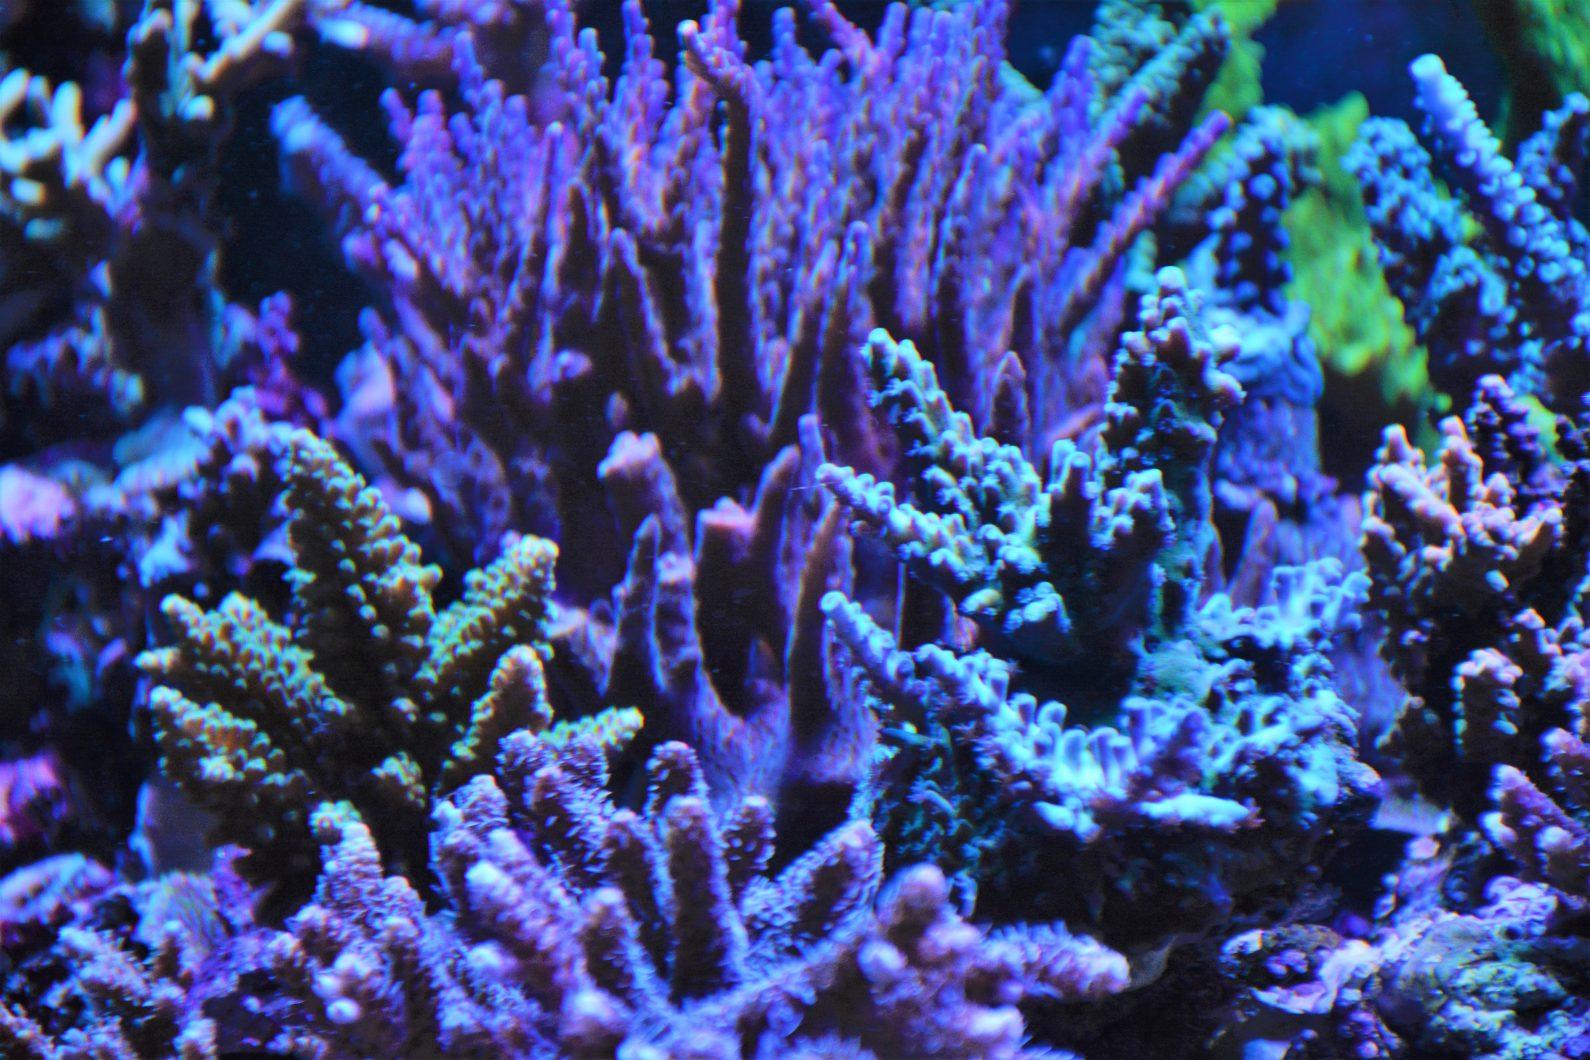 púrpura sps coral pop leds